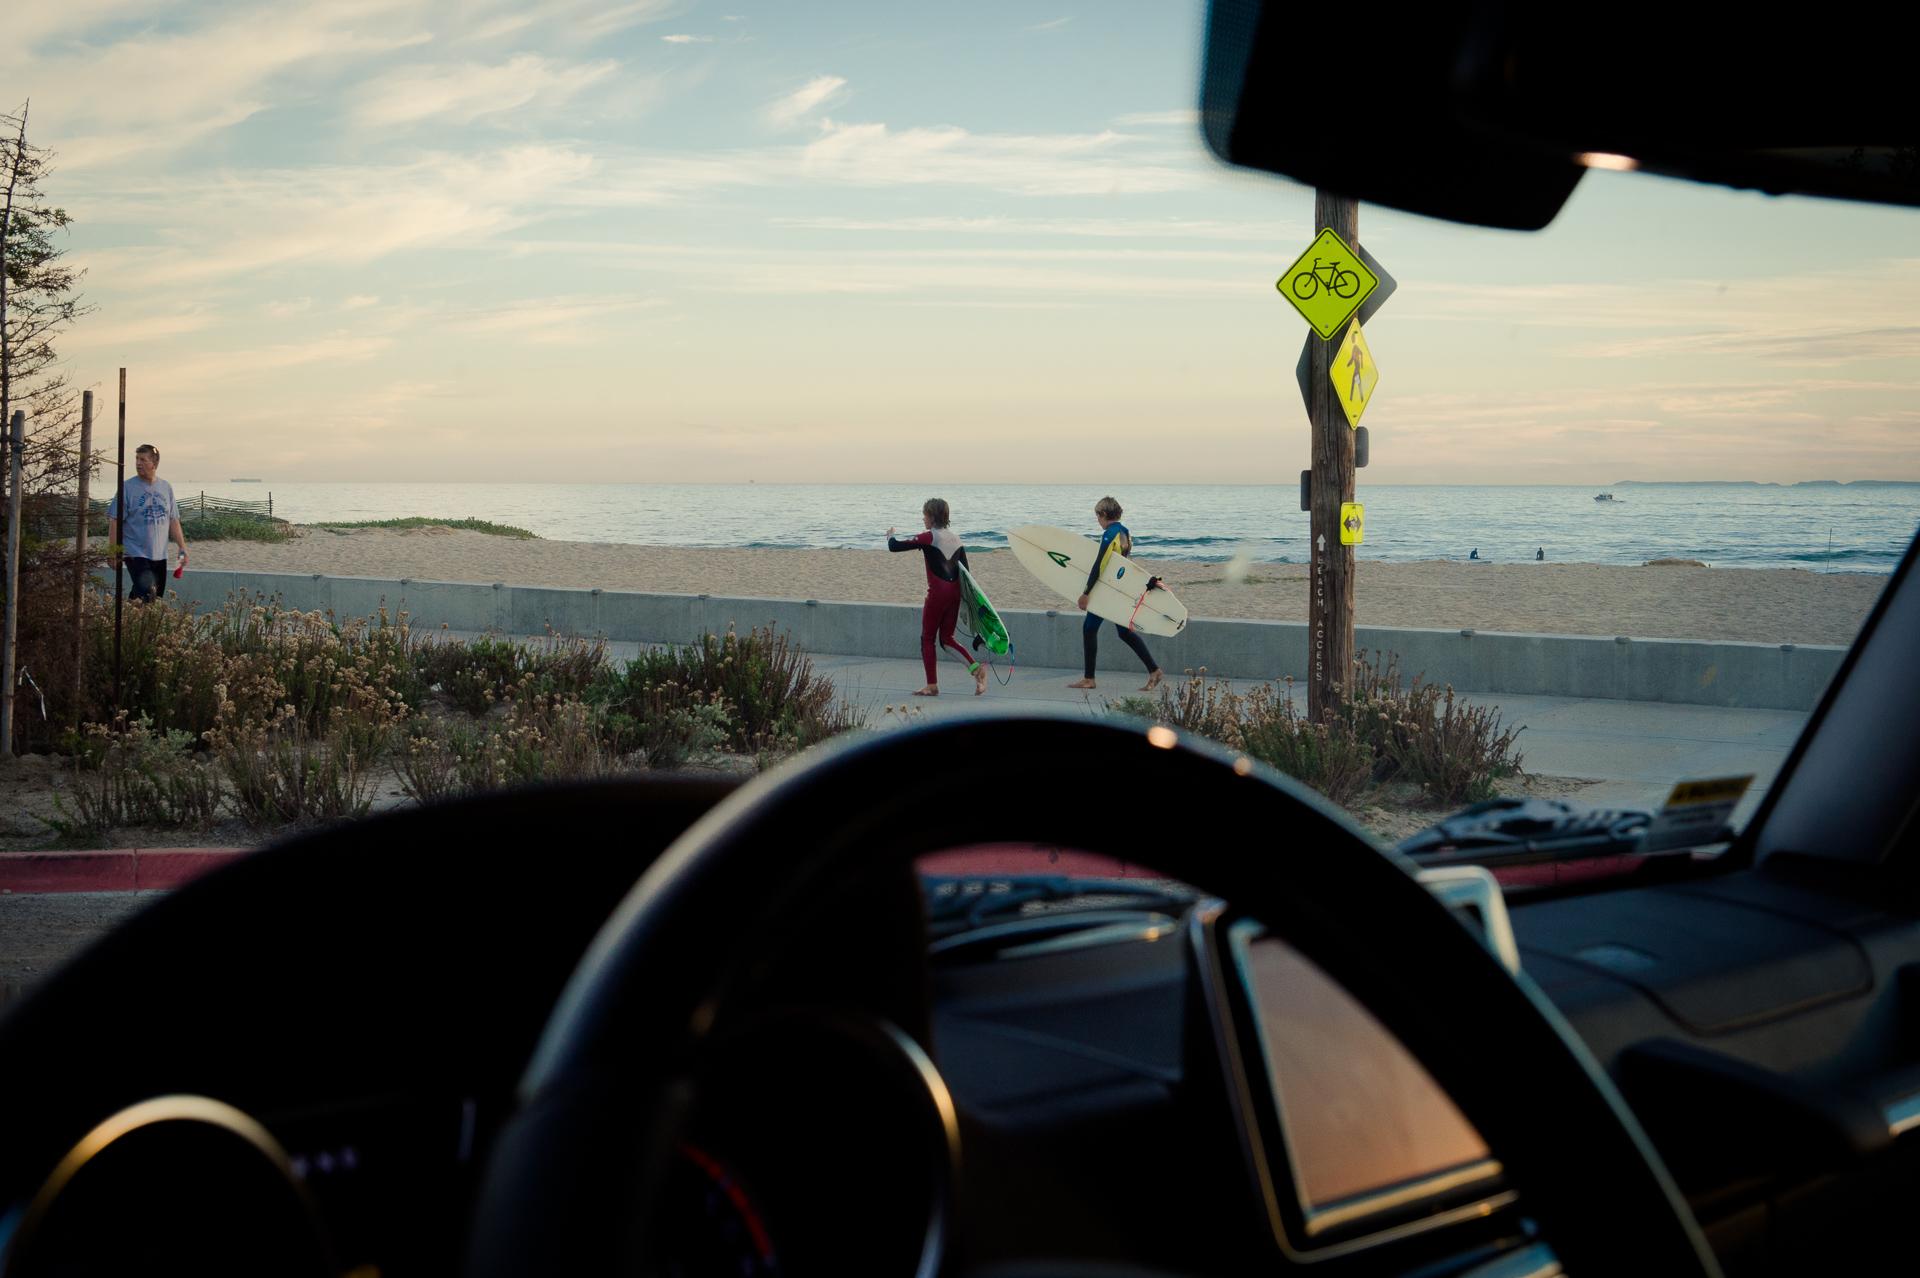 2014-Mercedes-Benz-G500-G550-braun-Kalifornien-mbrt14-55